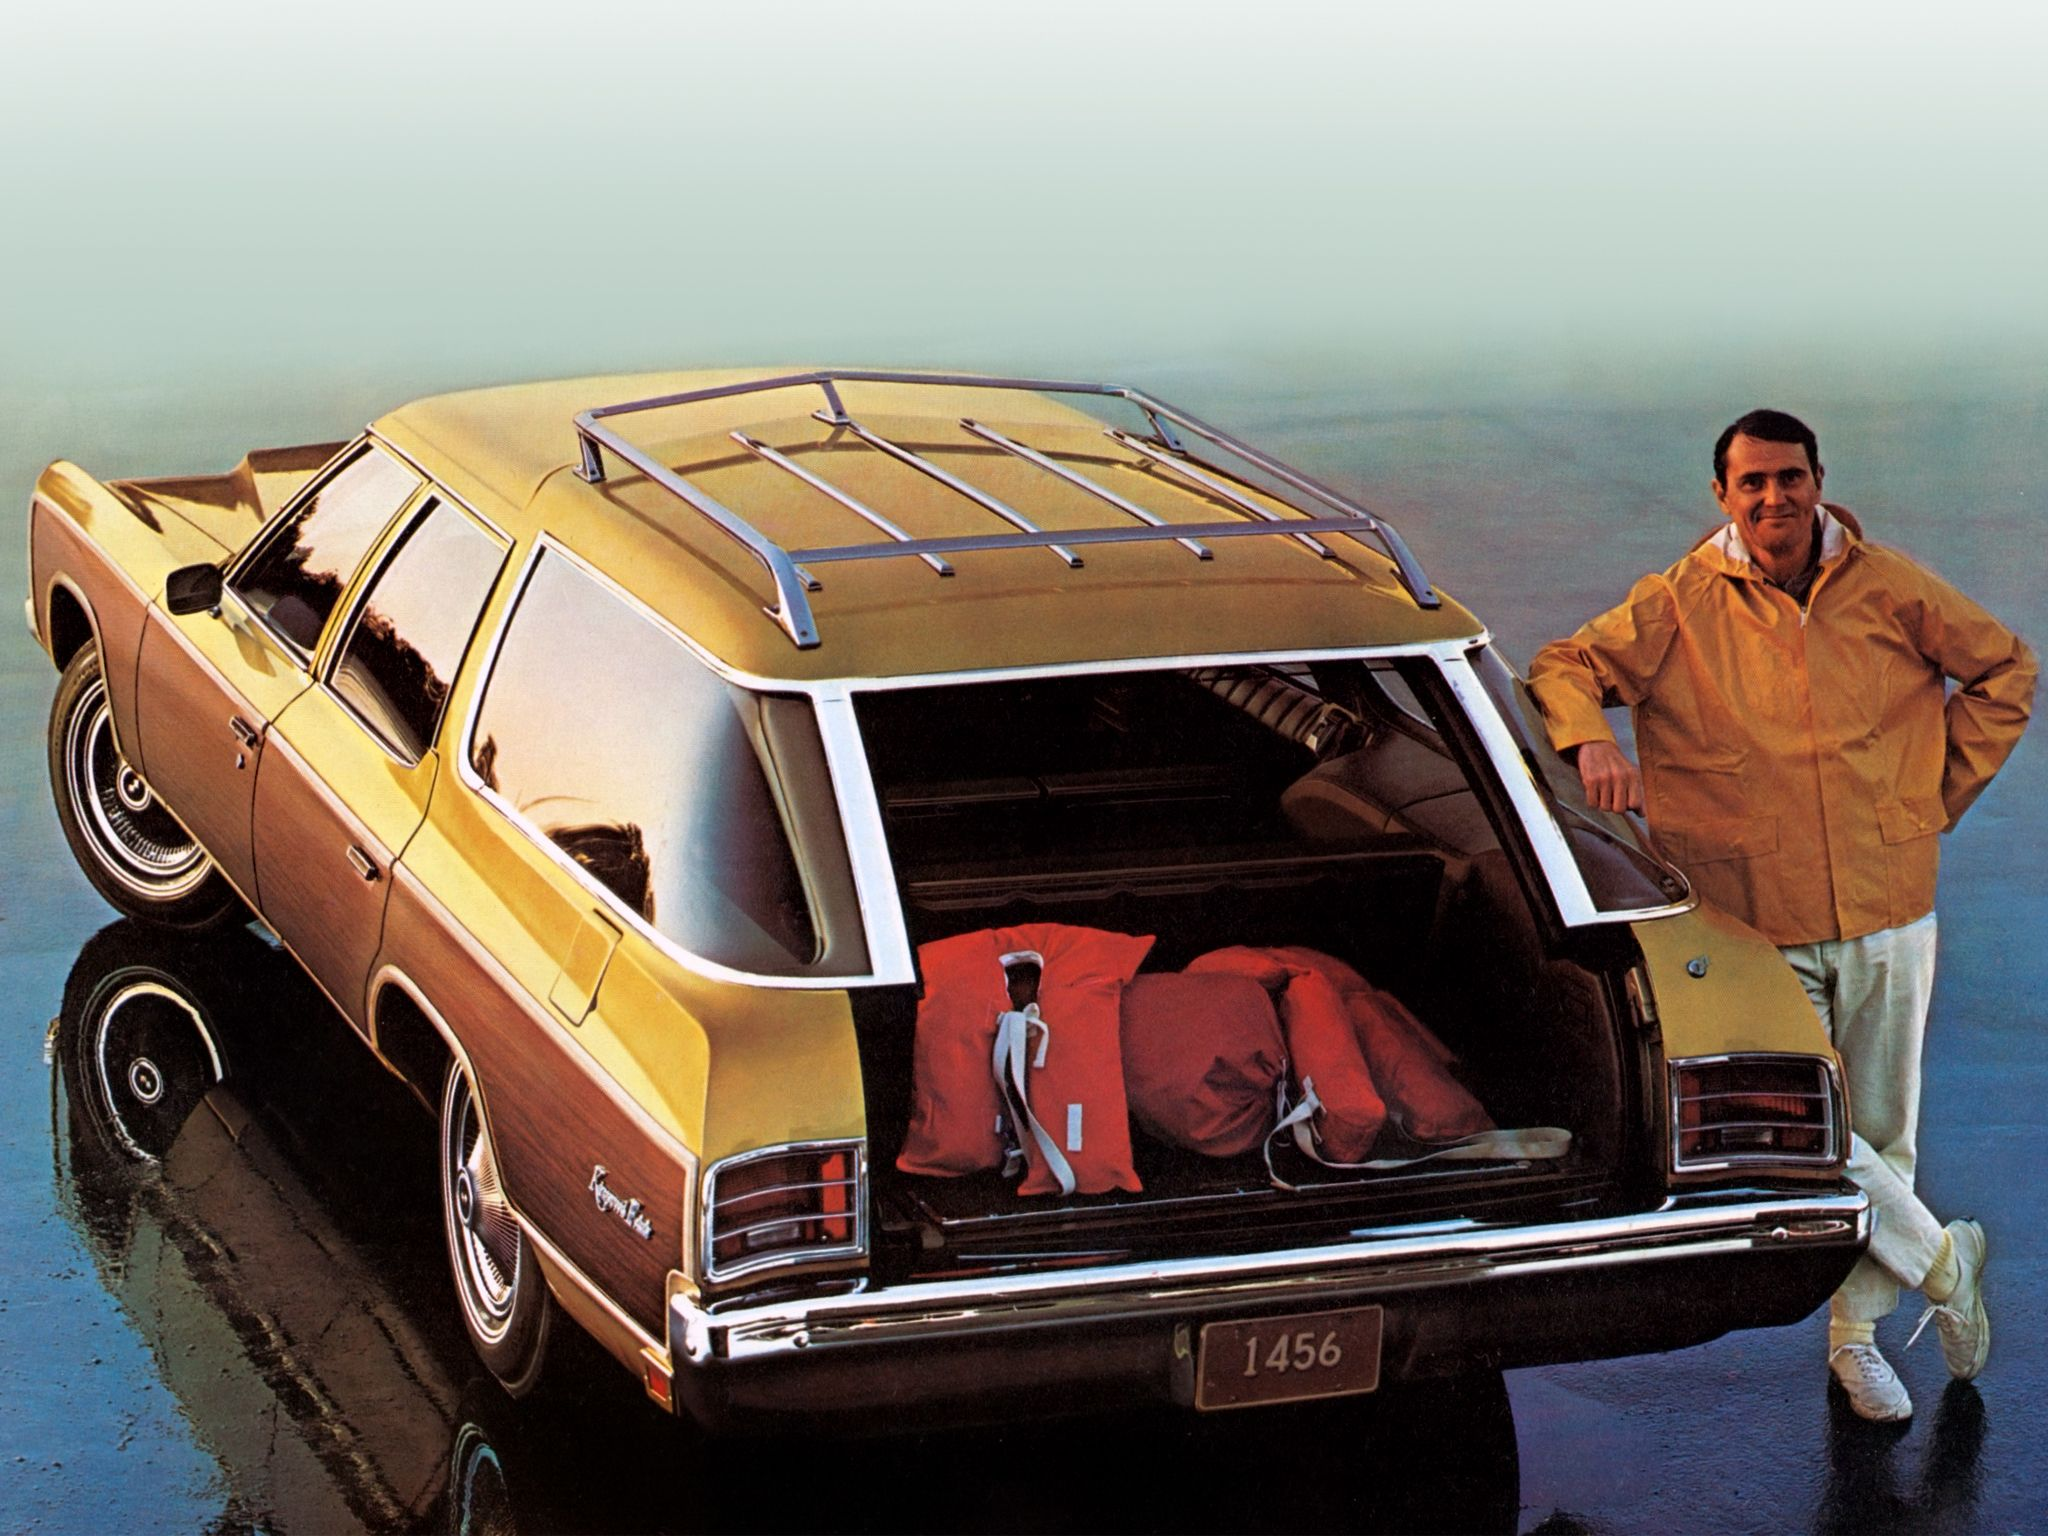 1971 Chevrolet Kingswood Estate Brochure Photo I Feel Fortunate